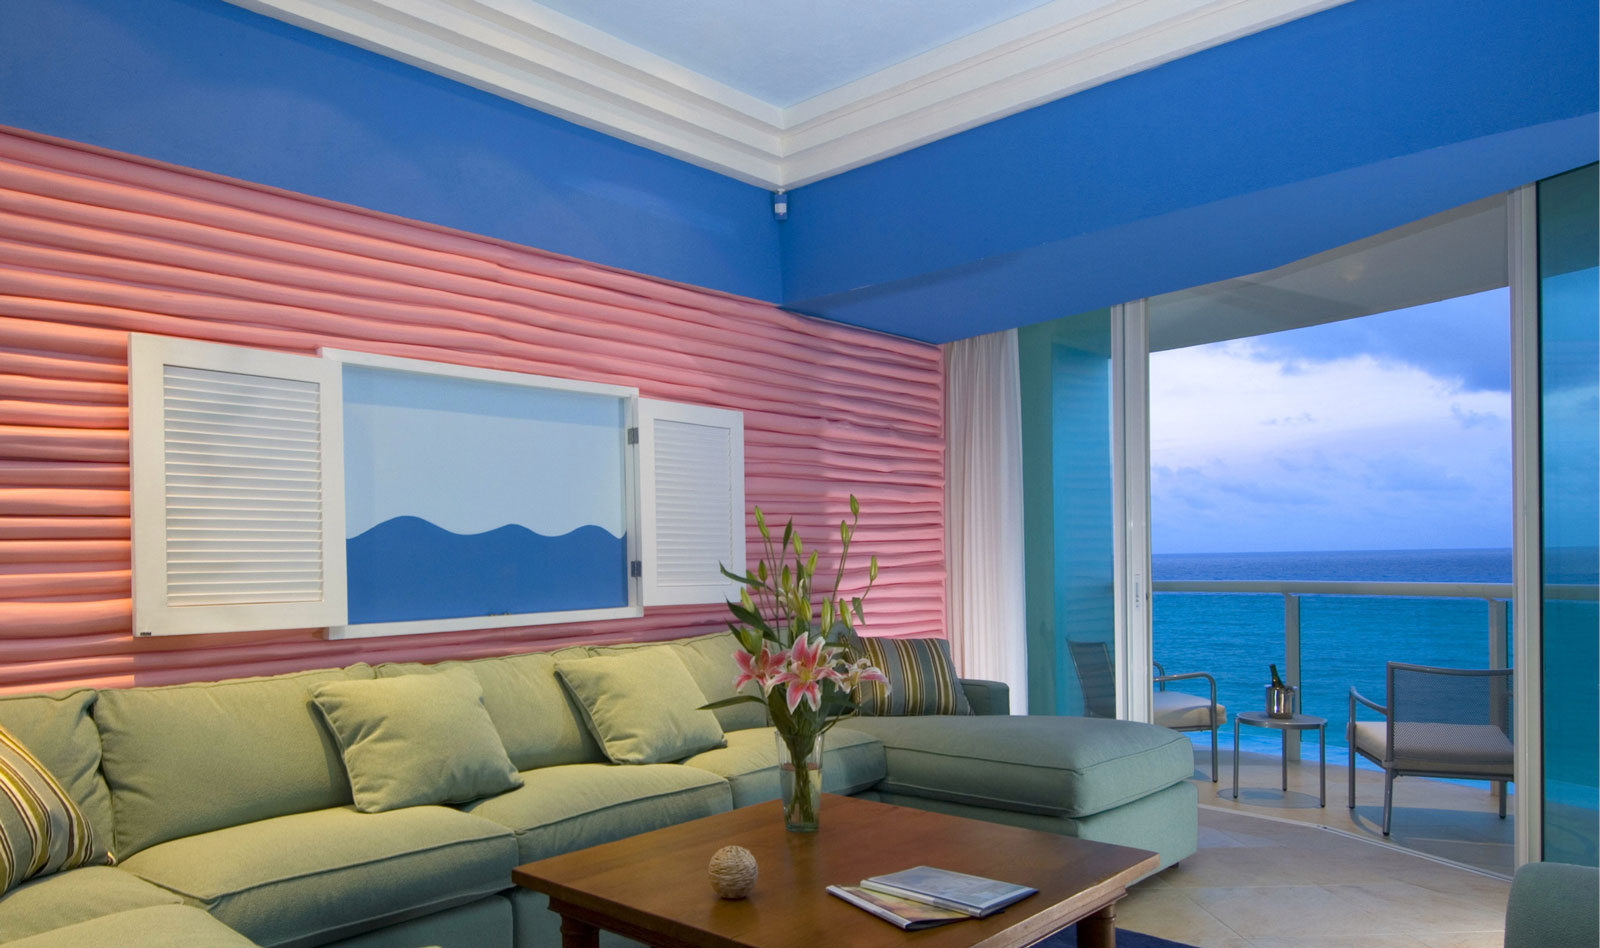 Condo apartment interior design cancun turnkey jerry jacobs for Condo apartment interior design